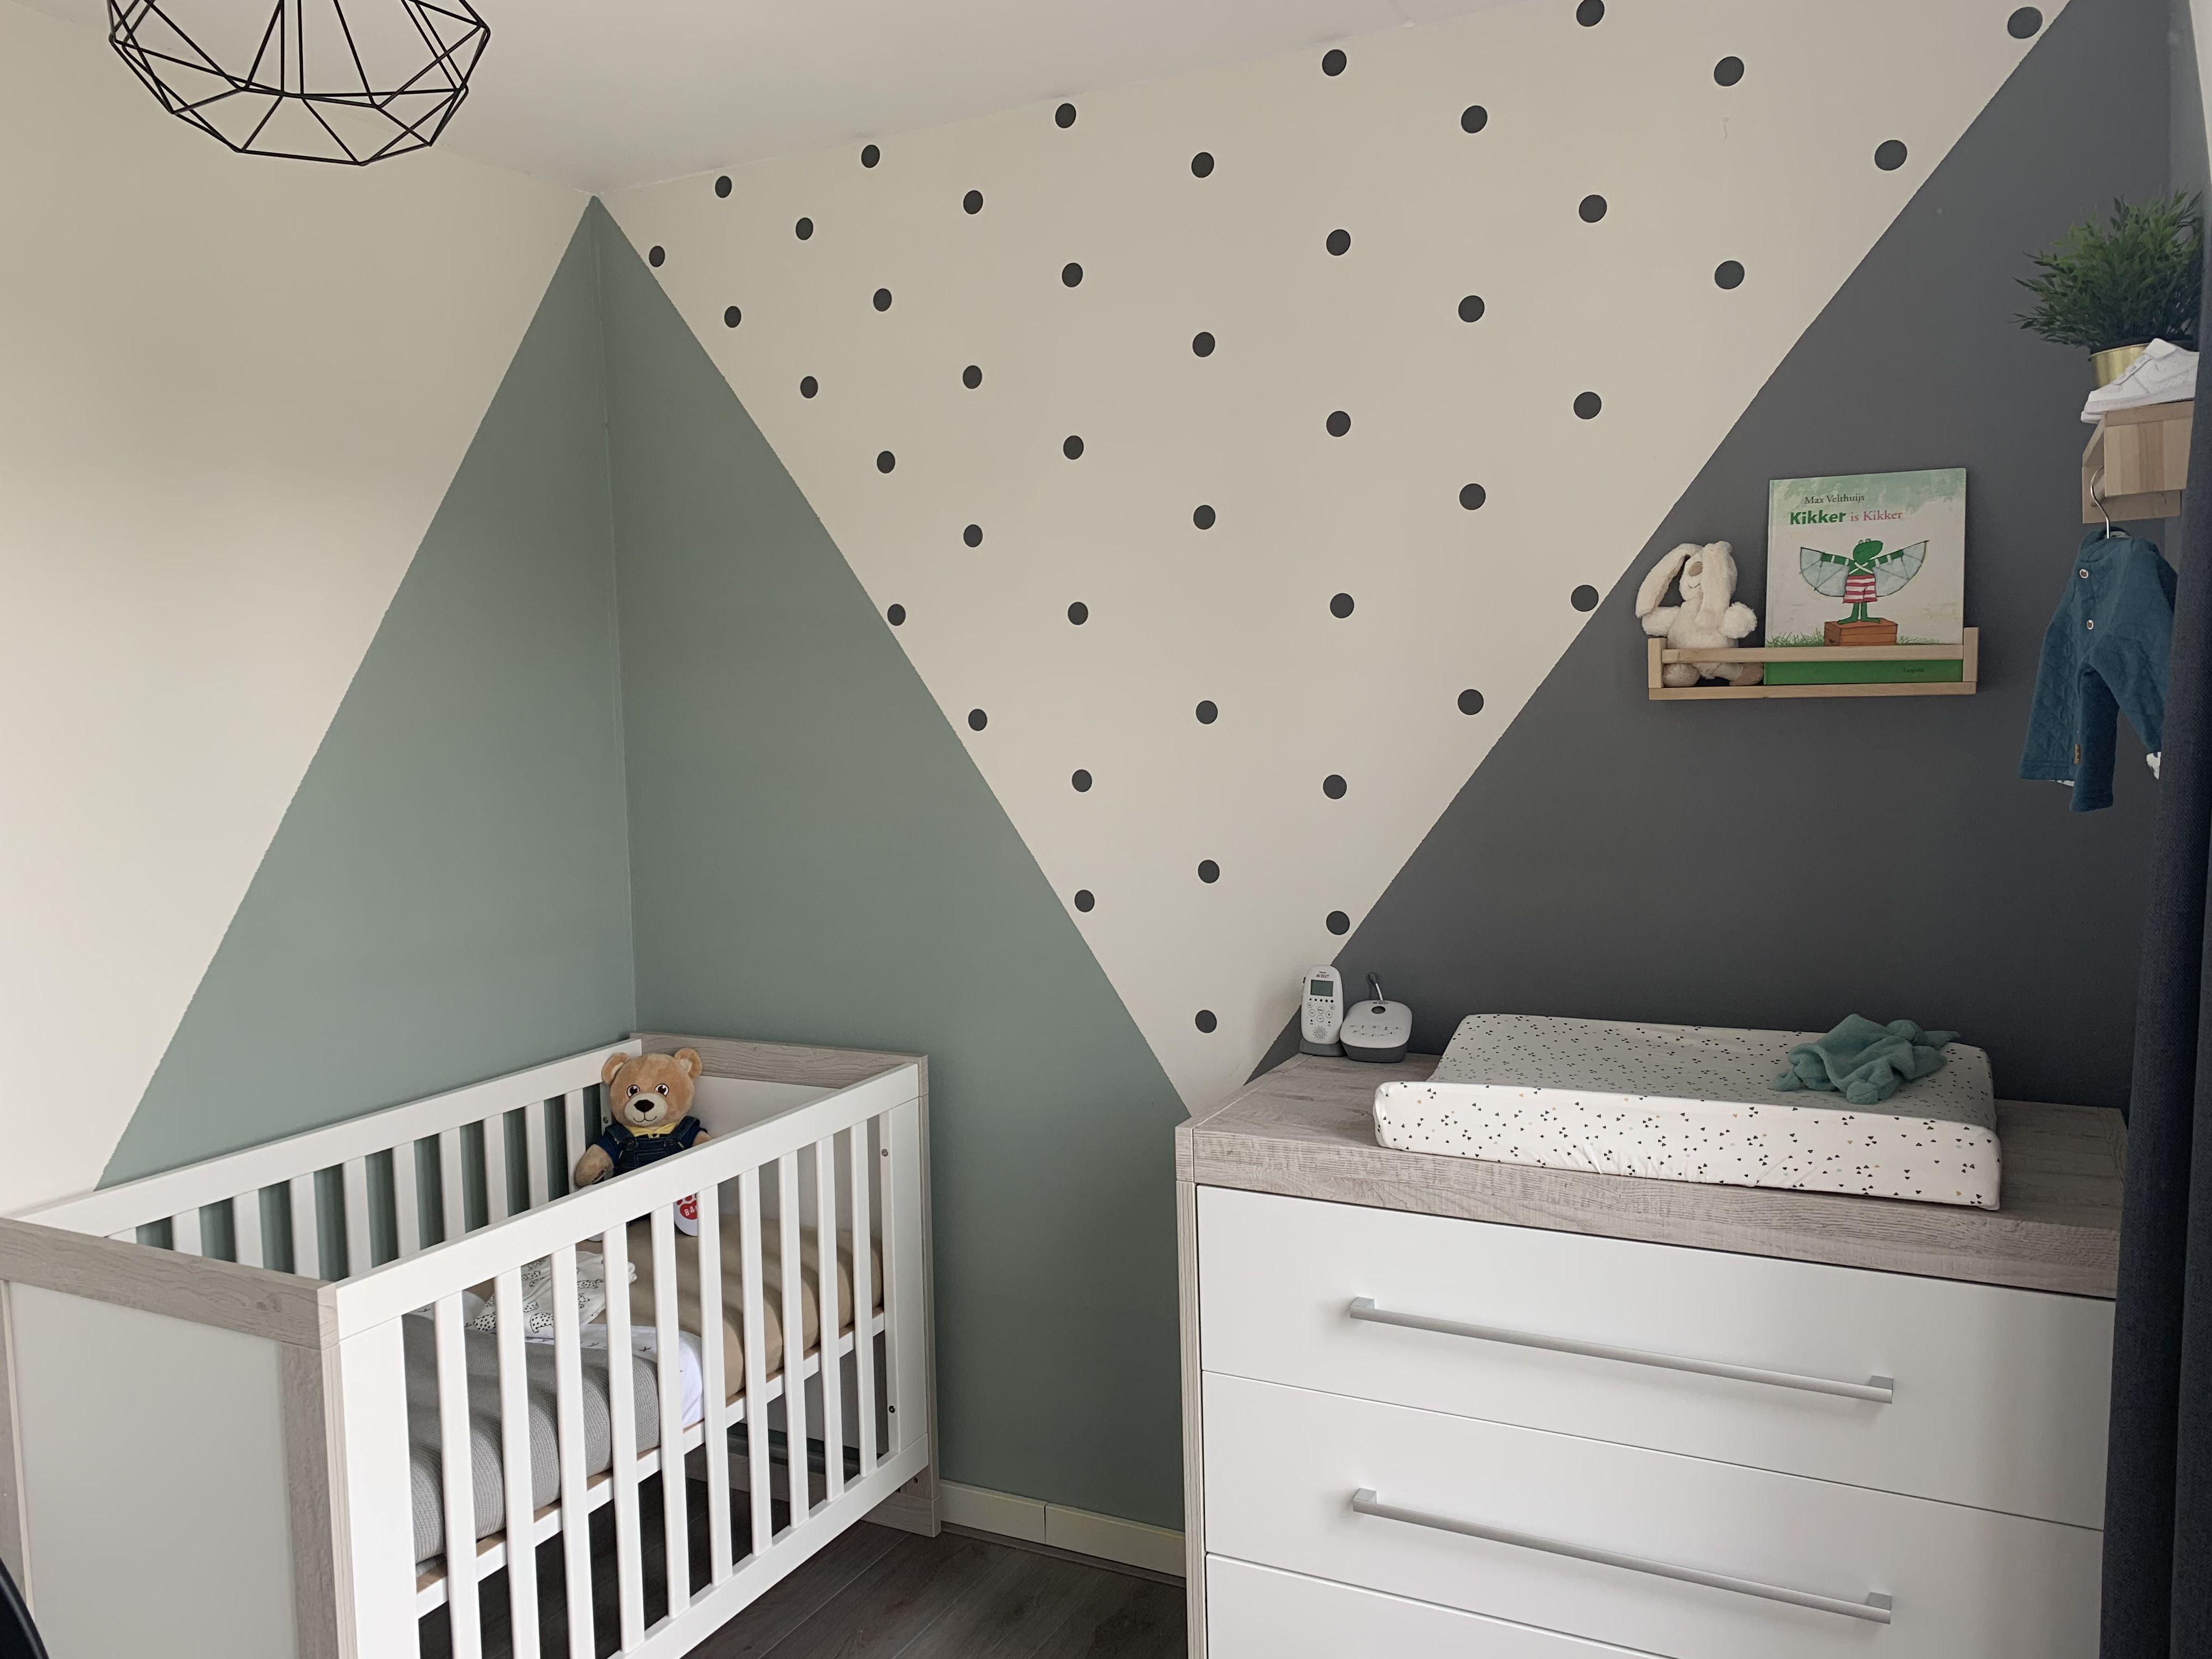 Babykamer Babykamer Inrichting Babykamer Babykamer Decoratie